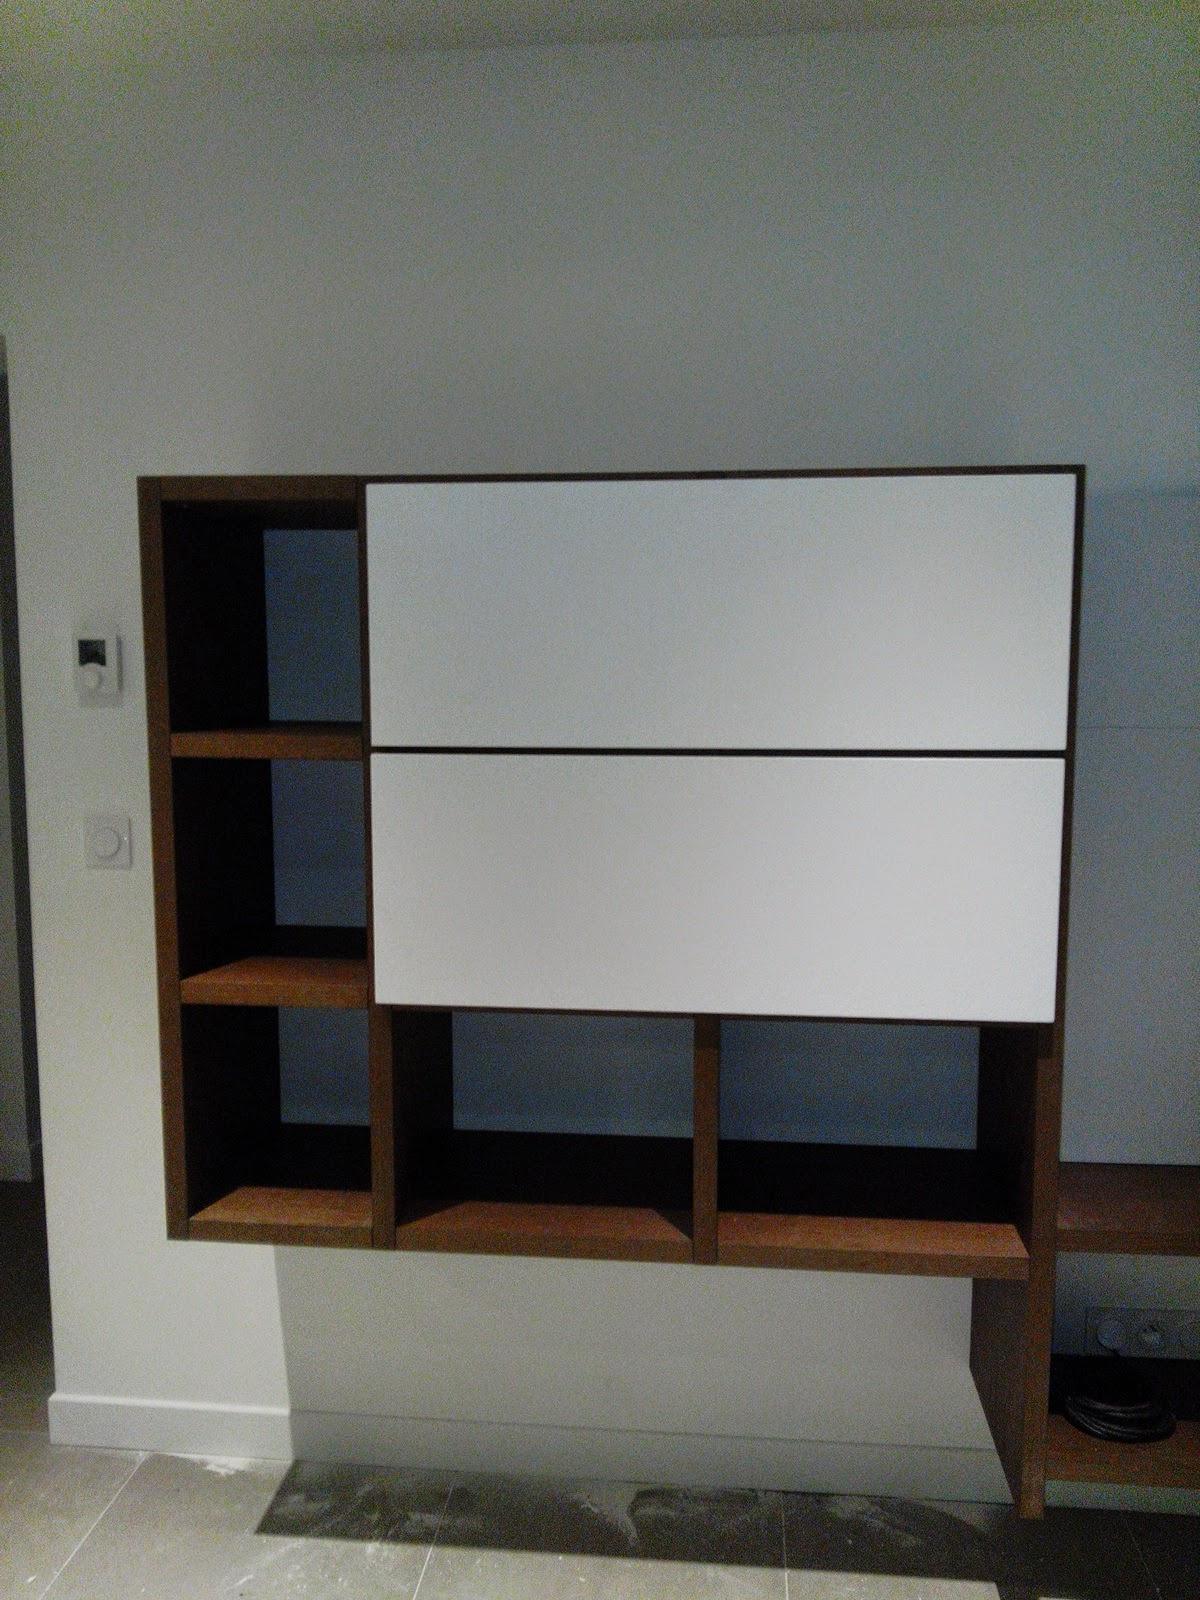 Base 33 meubles de salon suspendus l 39 italienne for Meuble hifi suspendu